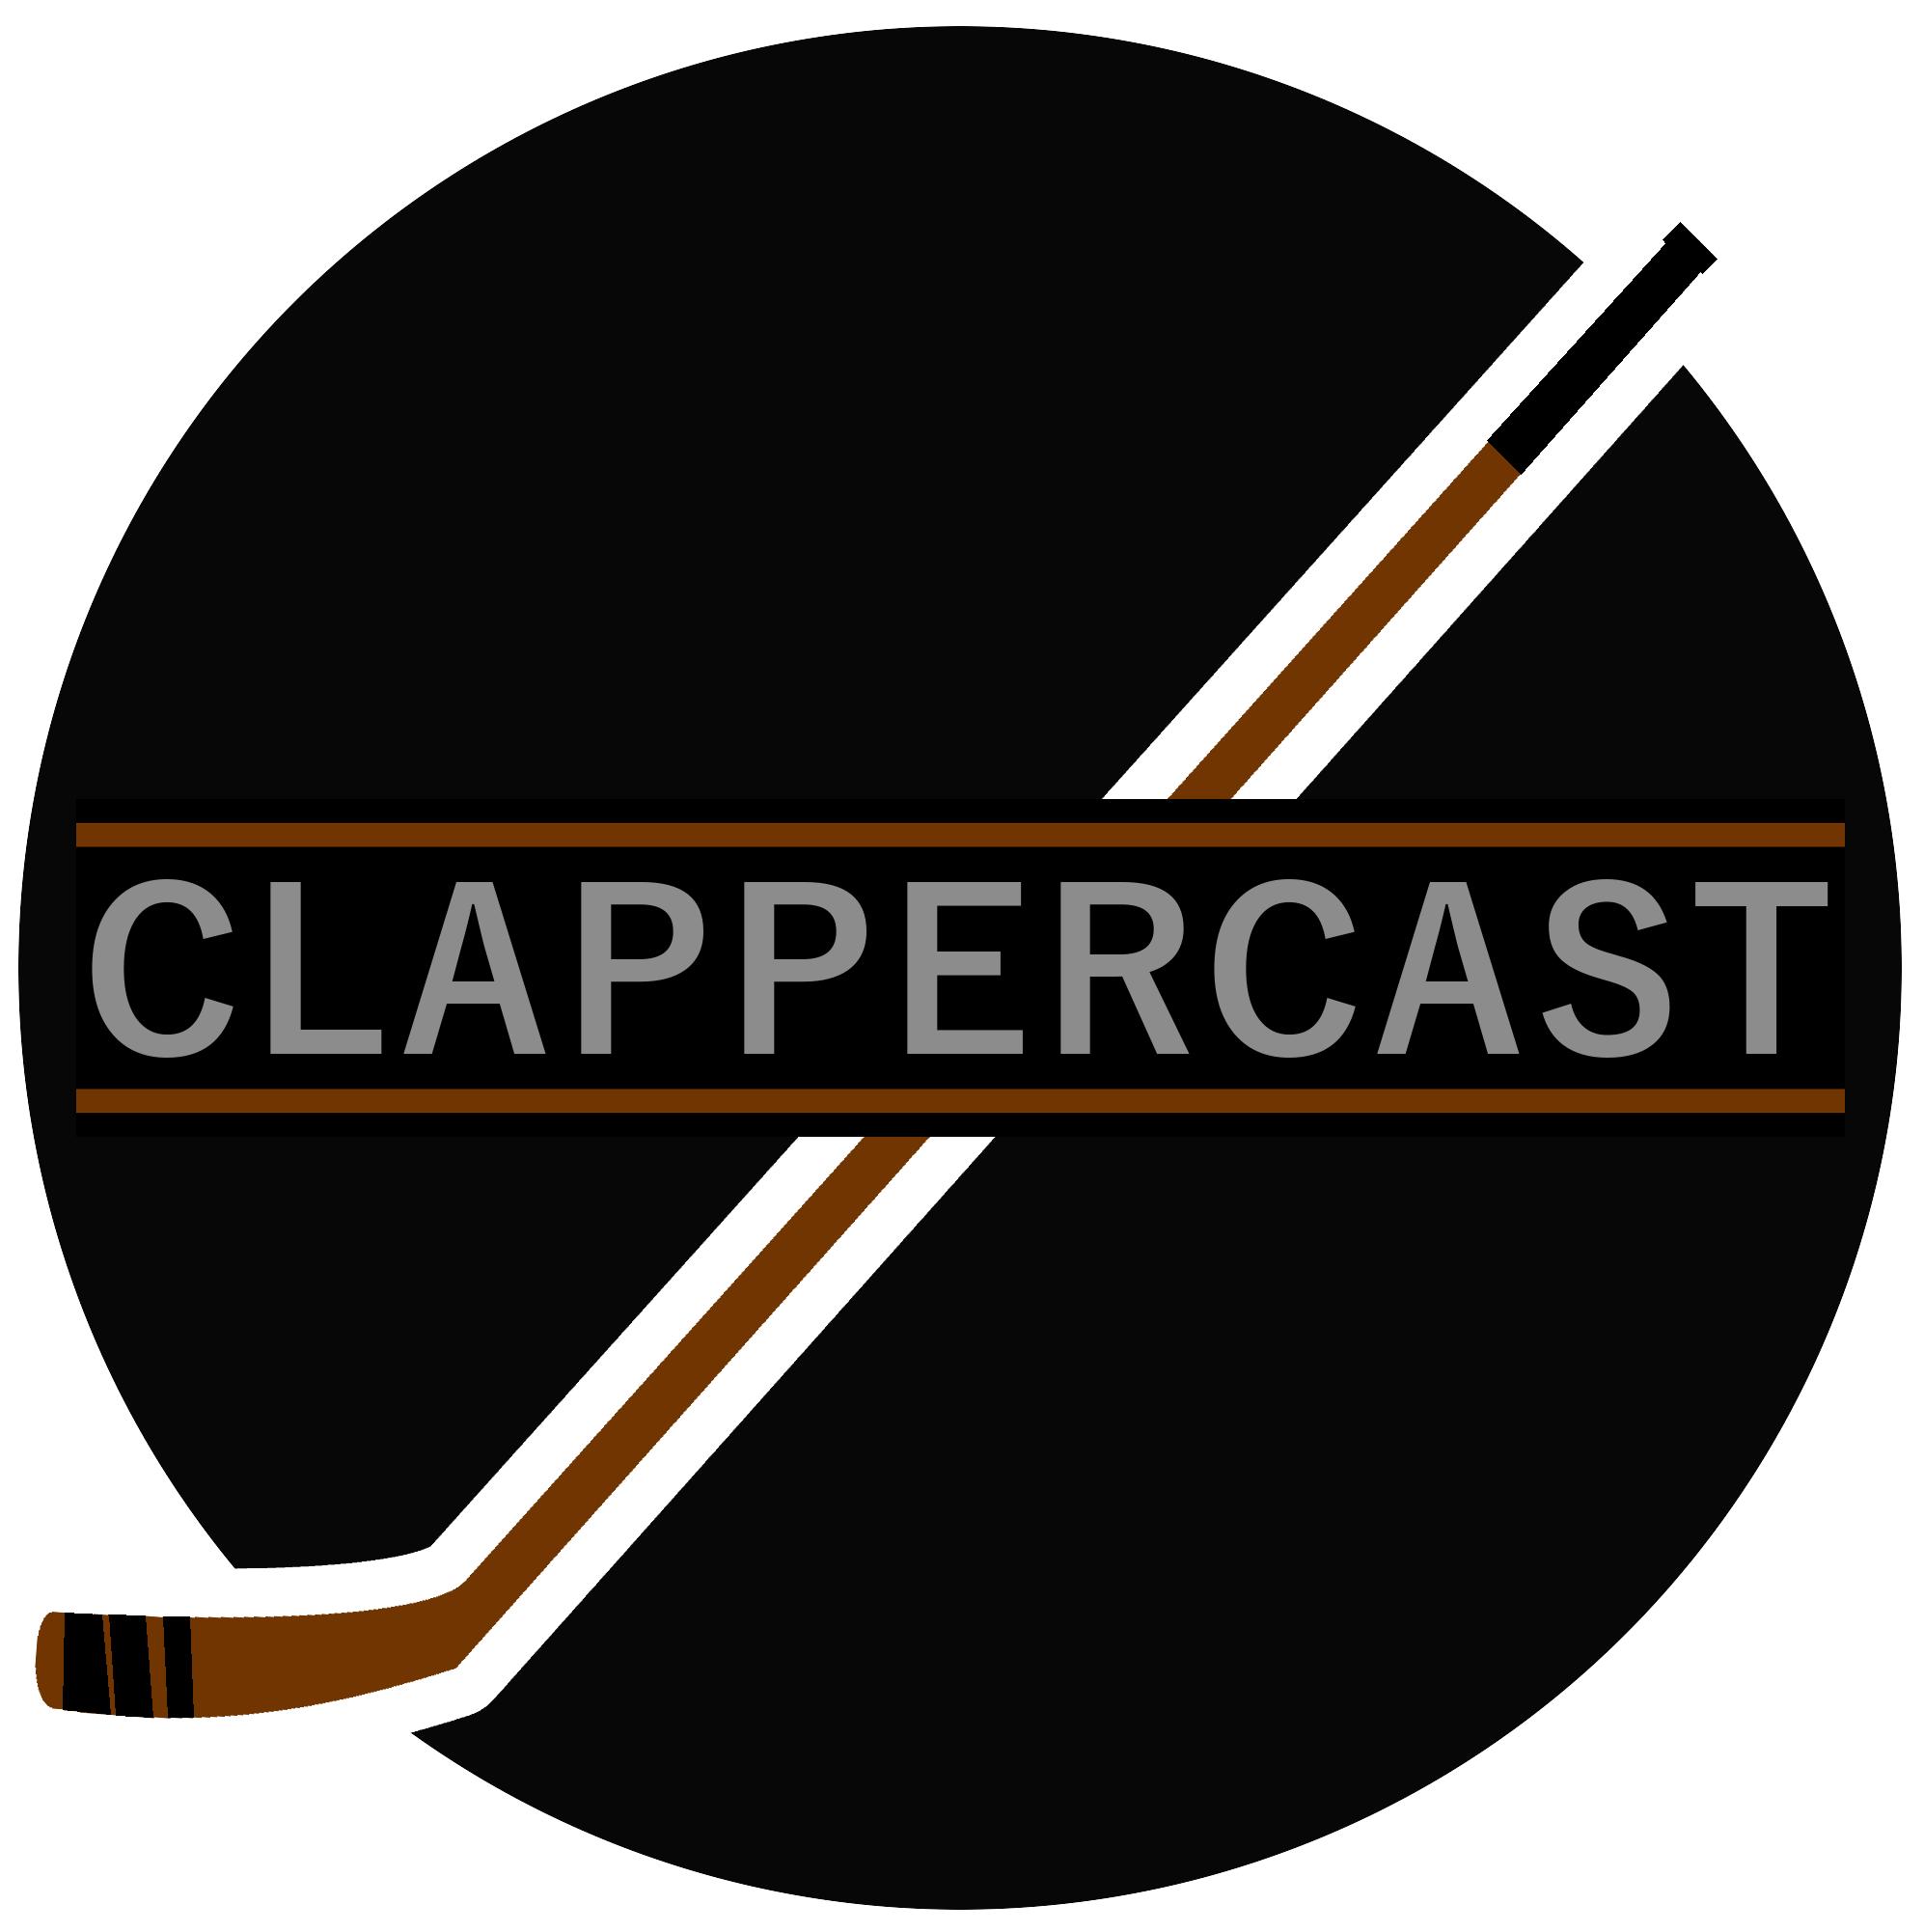 Clappercast Media